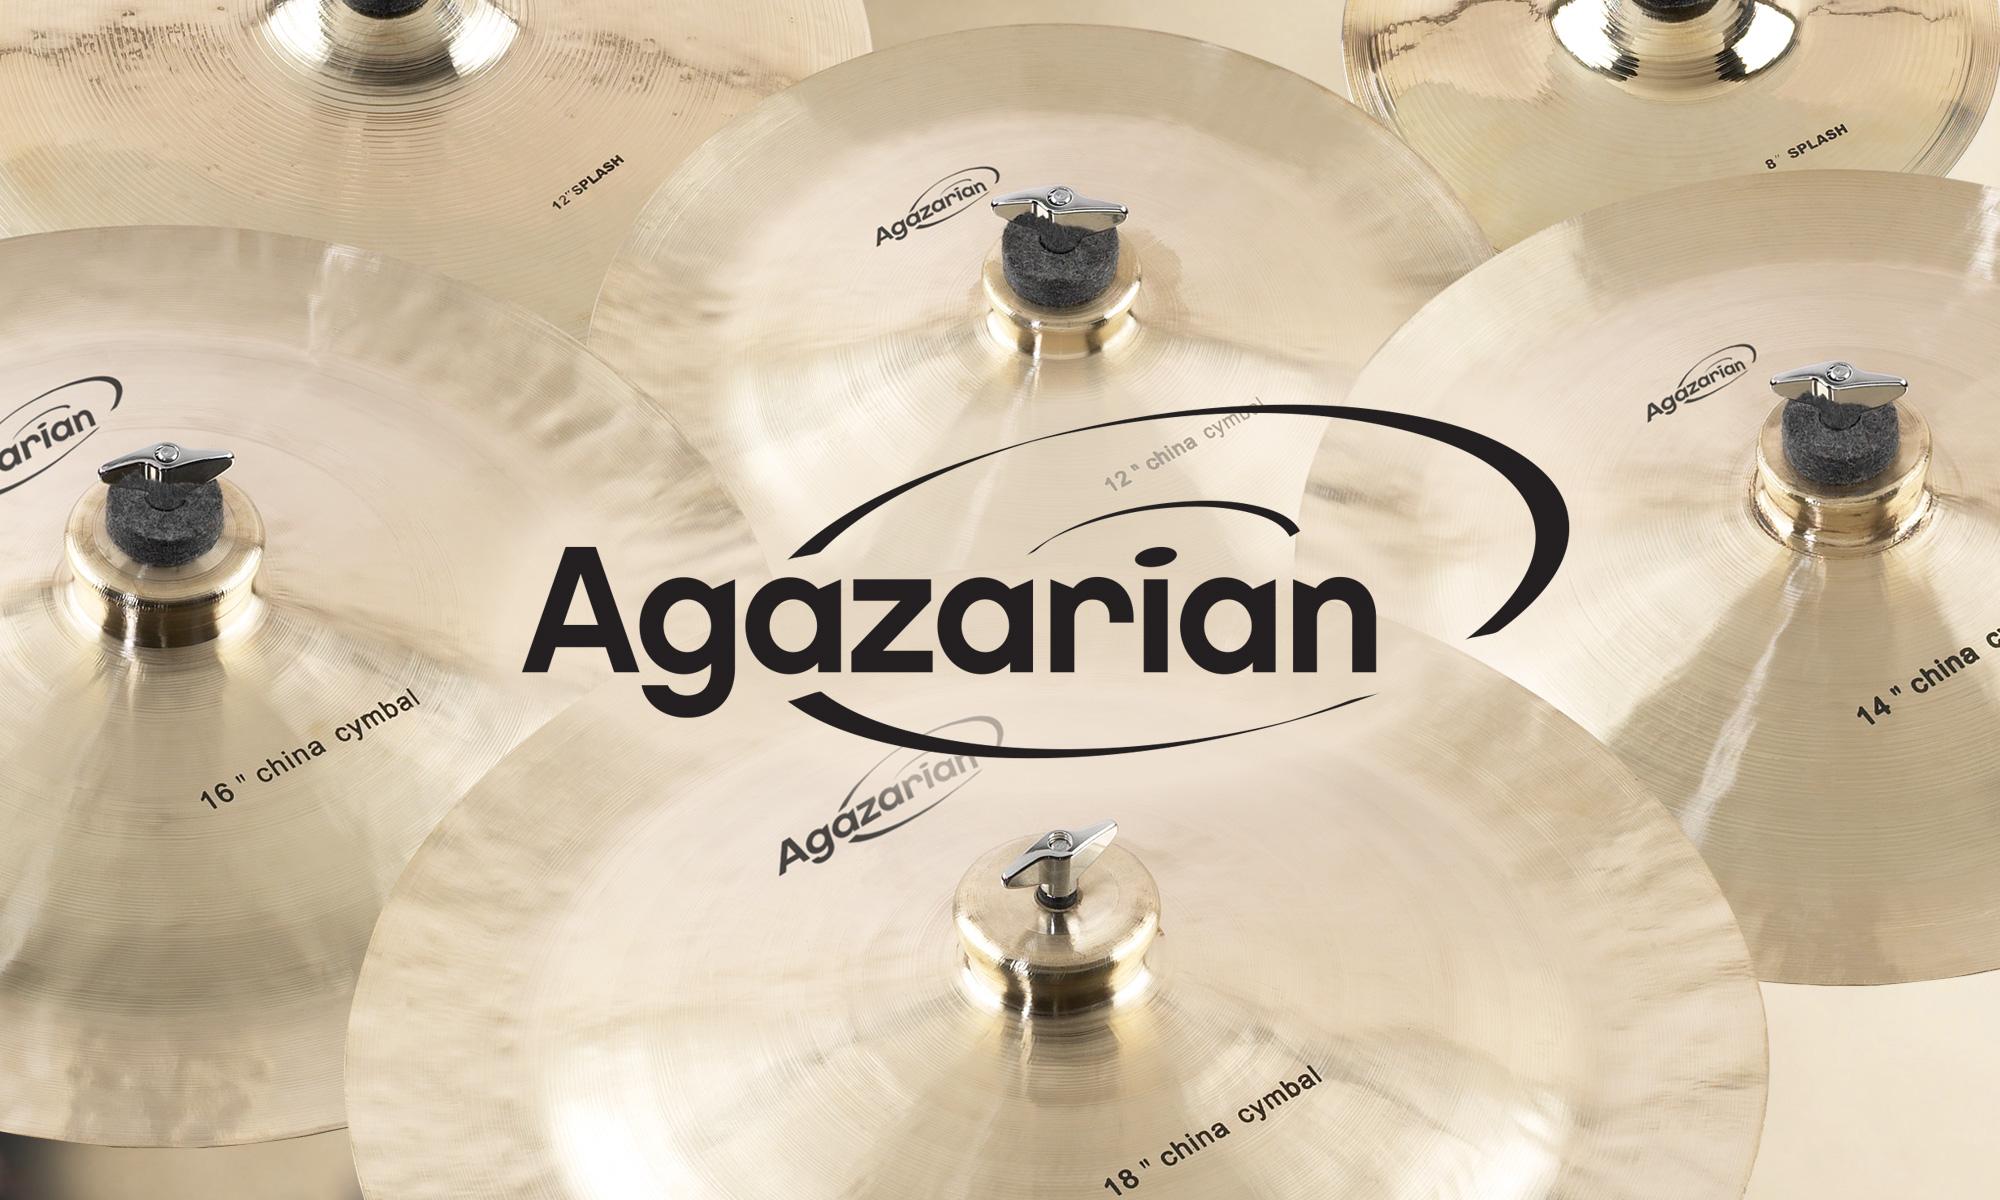 Agazarian Gongs